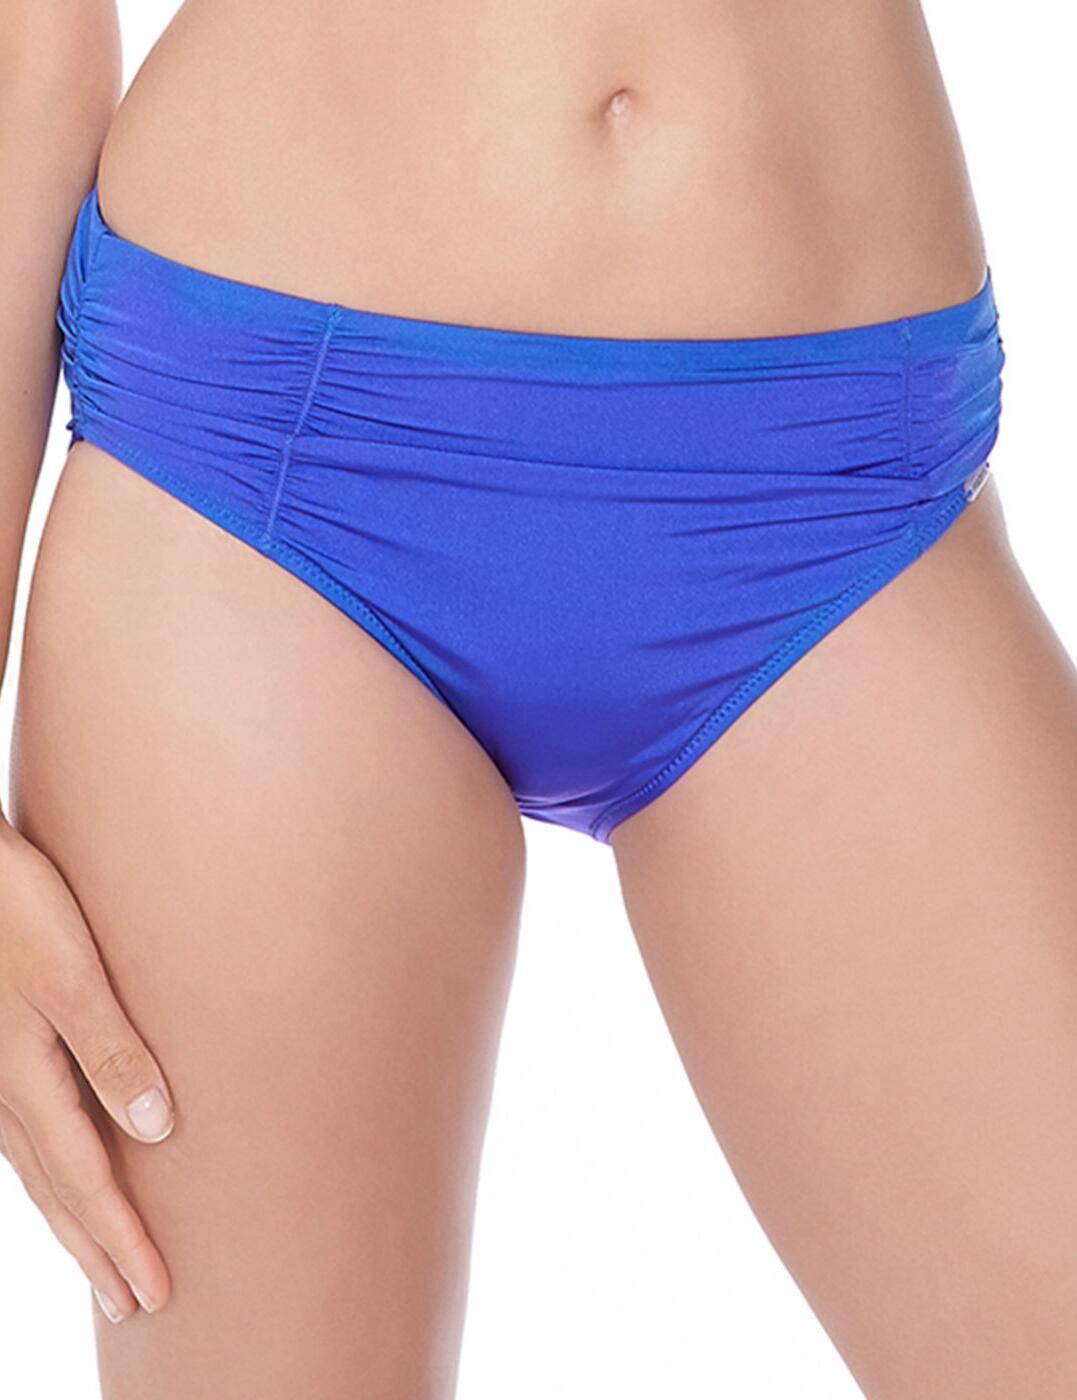 6155 Fantasie Los Cabos Gathered Bikini Brief - 6155 Cobalt